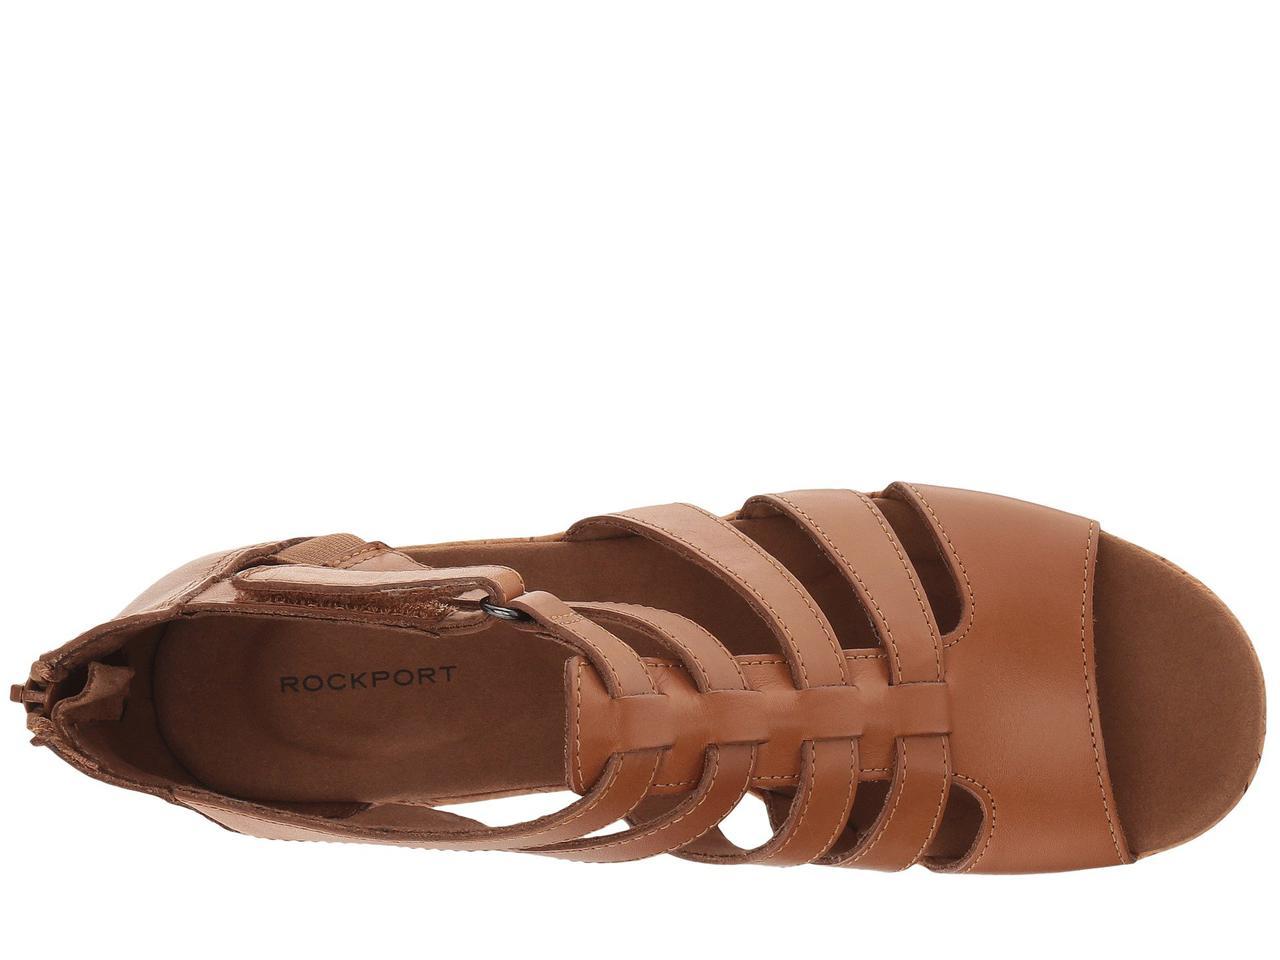 3c81cdb3f815 Туфли на каблуке (Оригинал) Rockport Briah Gladiator Dark Tan Leather